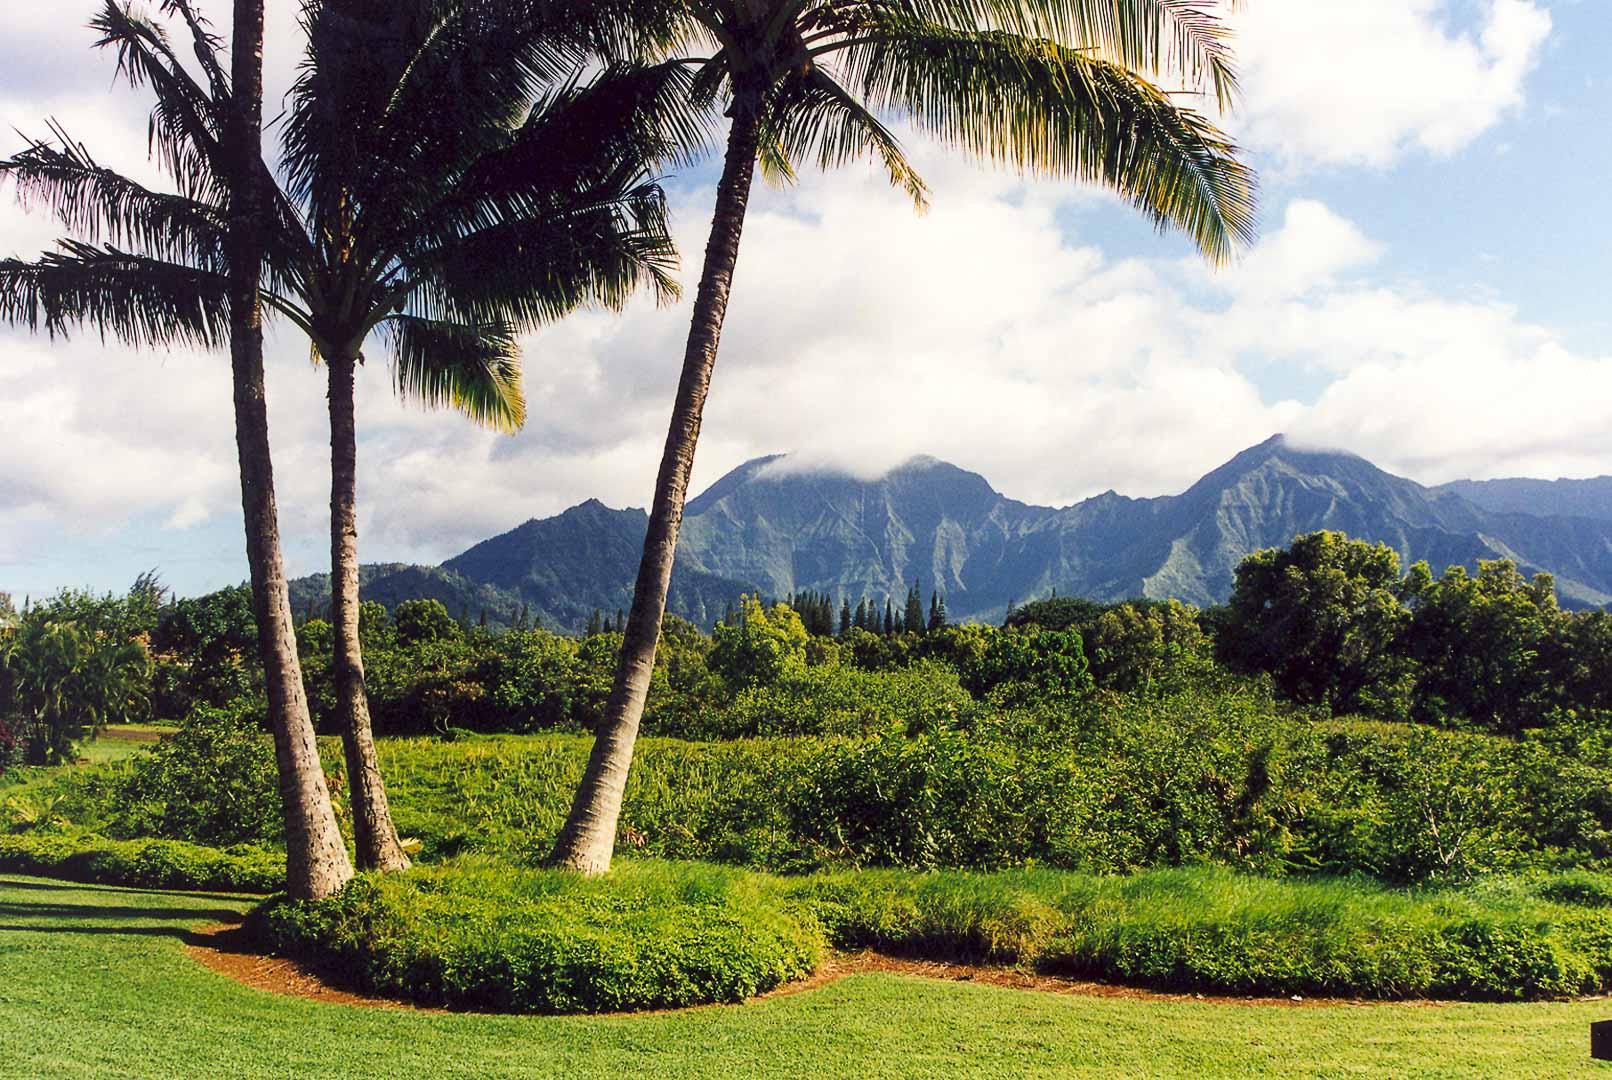 The beautiful view from VRI's Alii Kai Resort in Hawaii